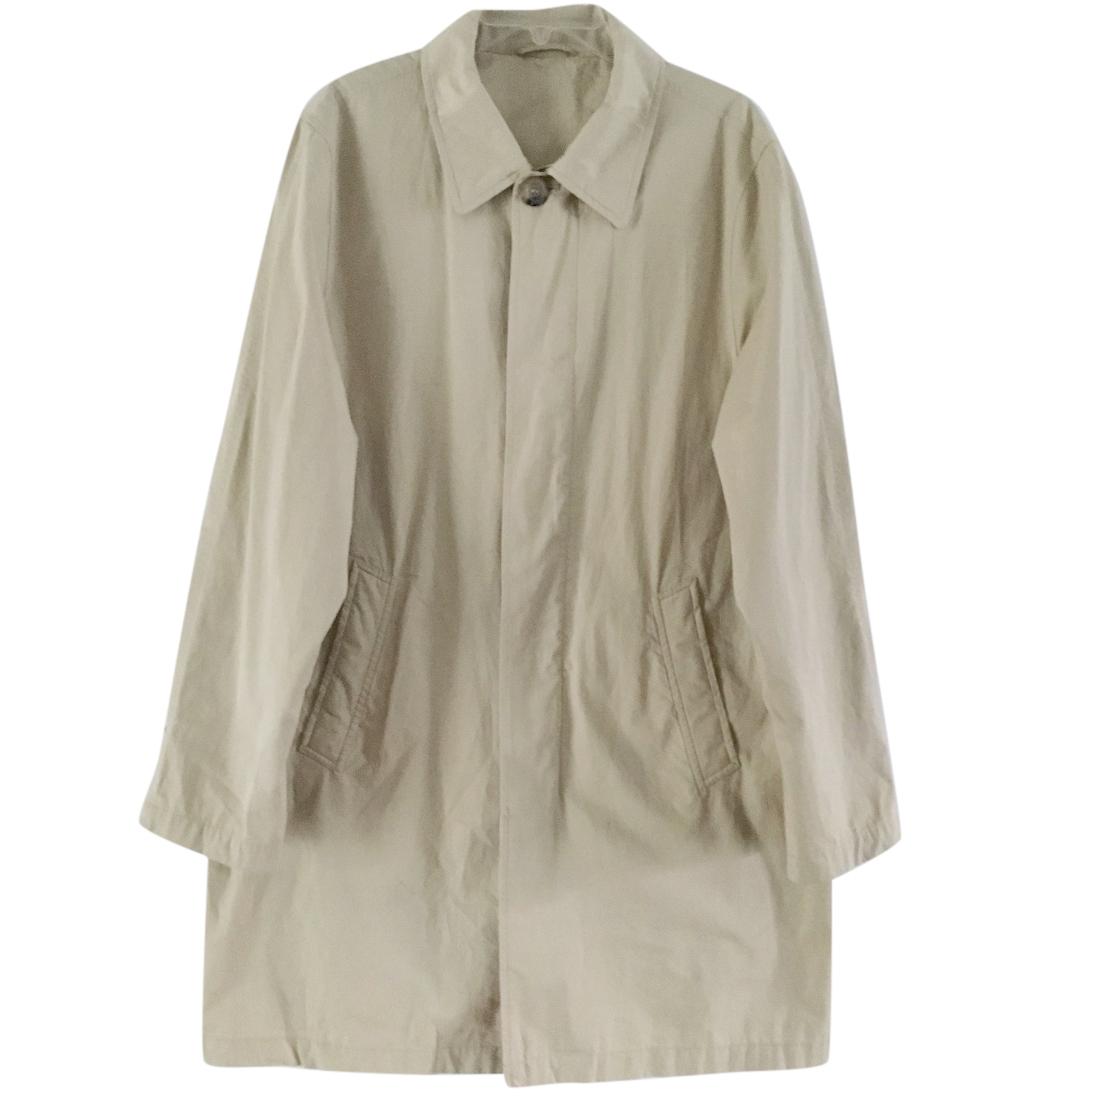 Massimo Dutti men's trench coat